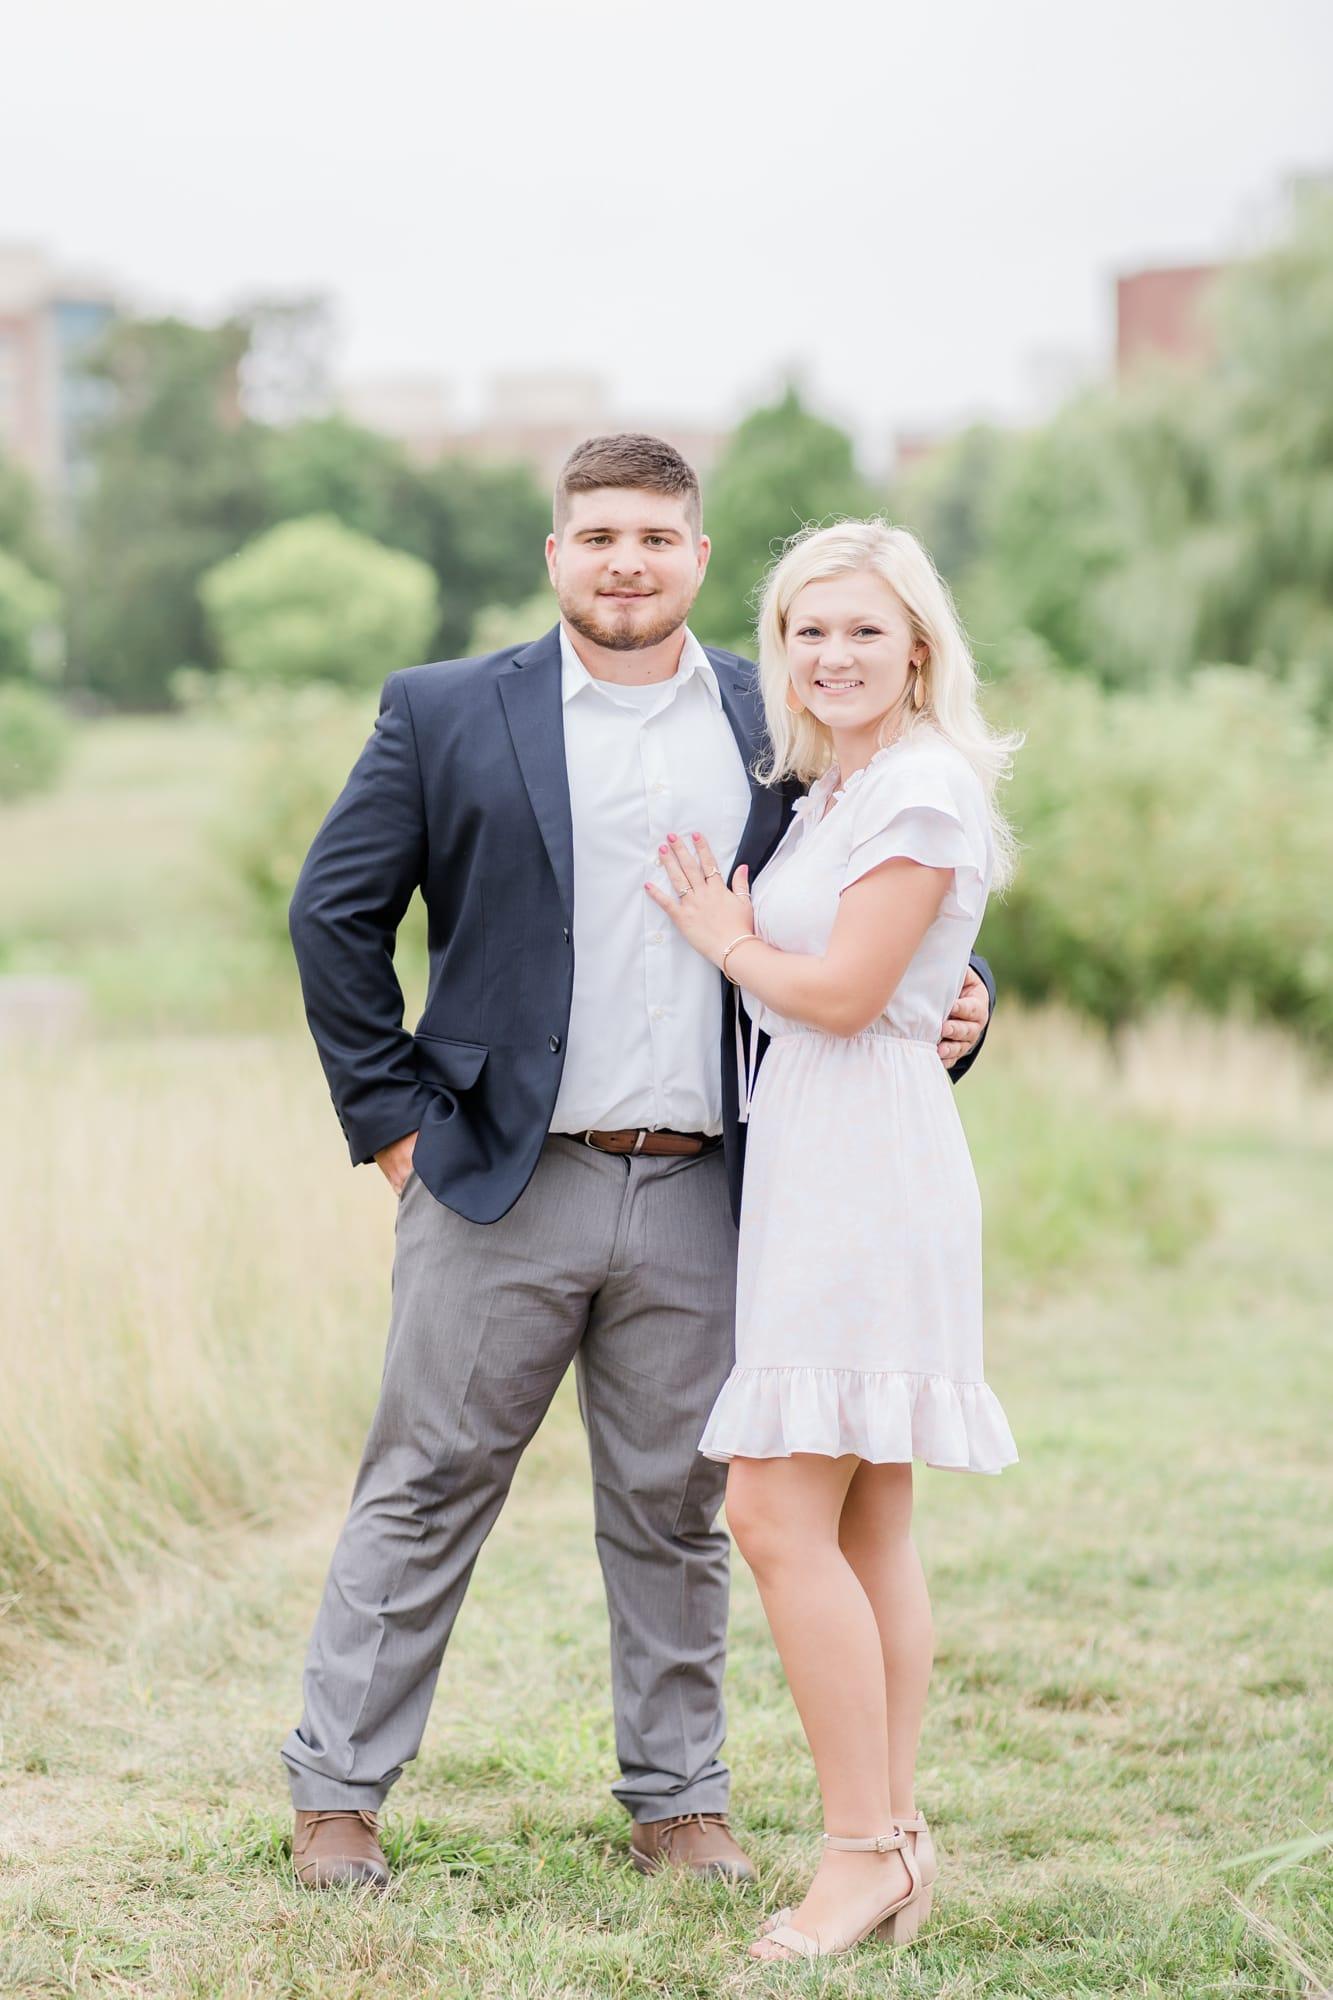 Couples portrait at Penn State arboretum